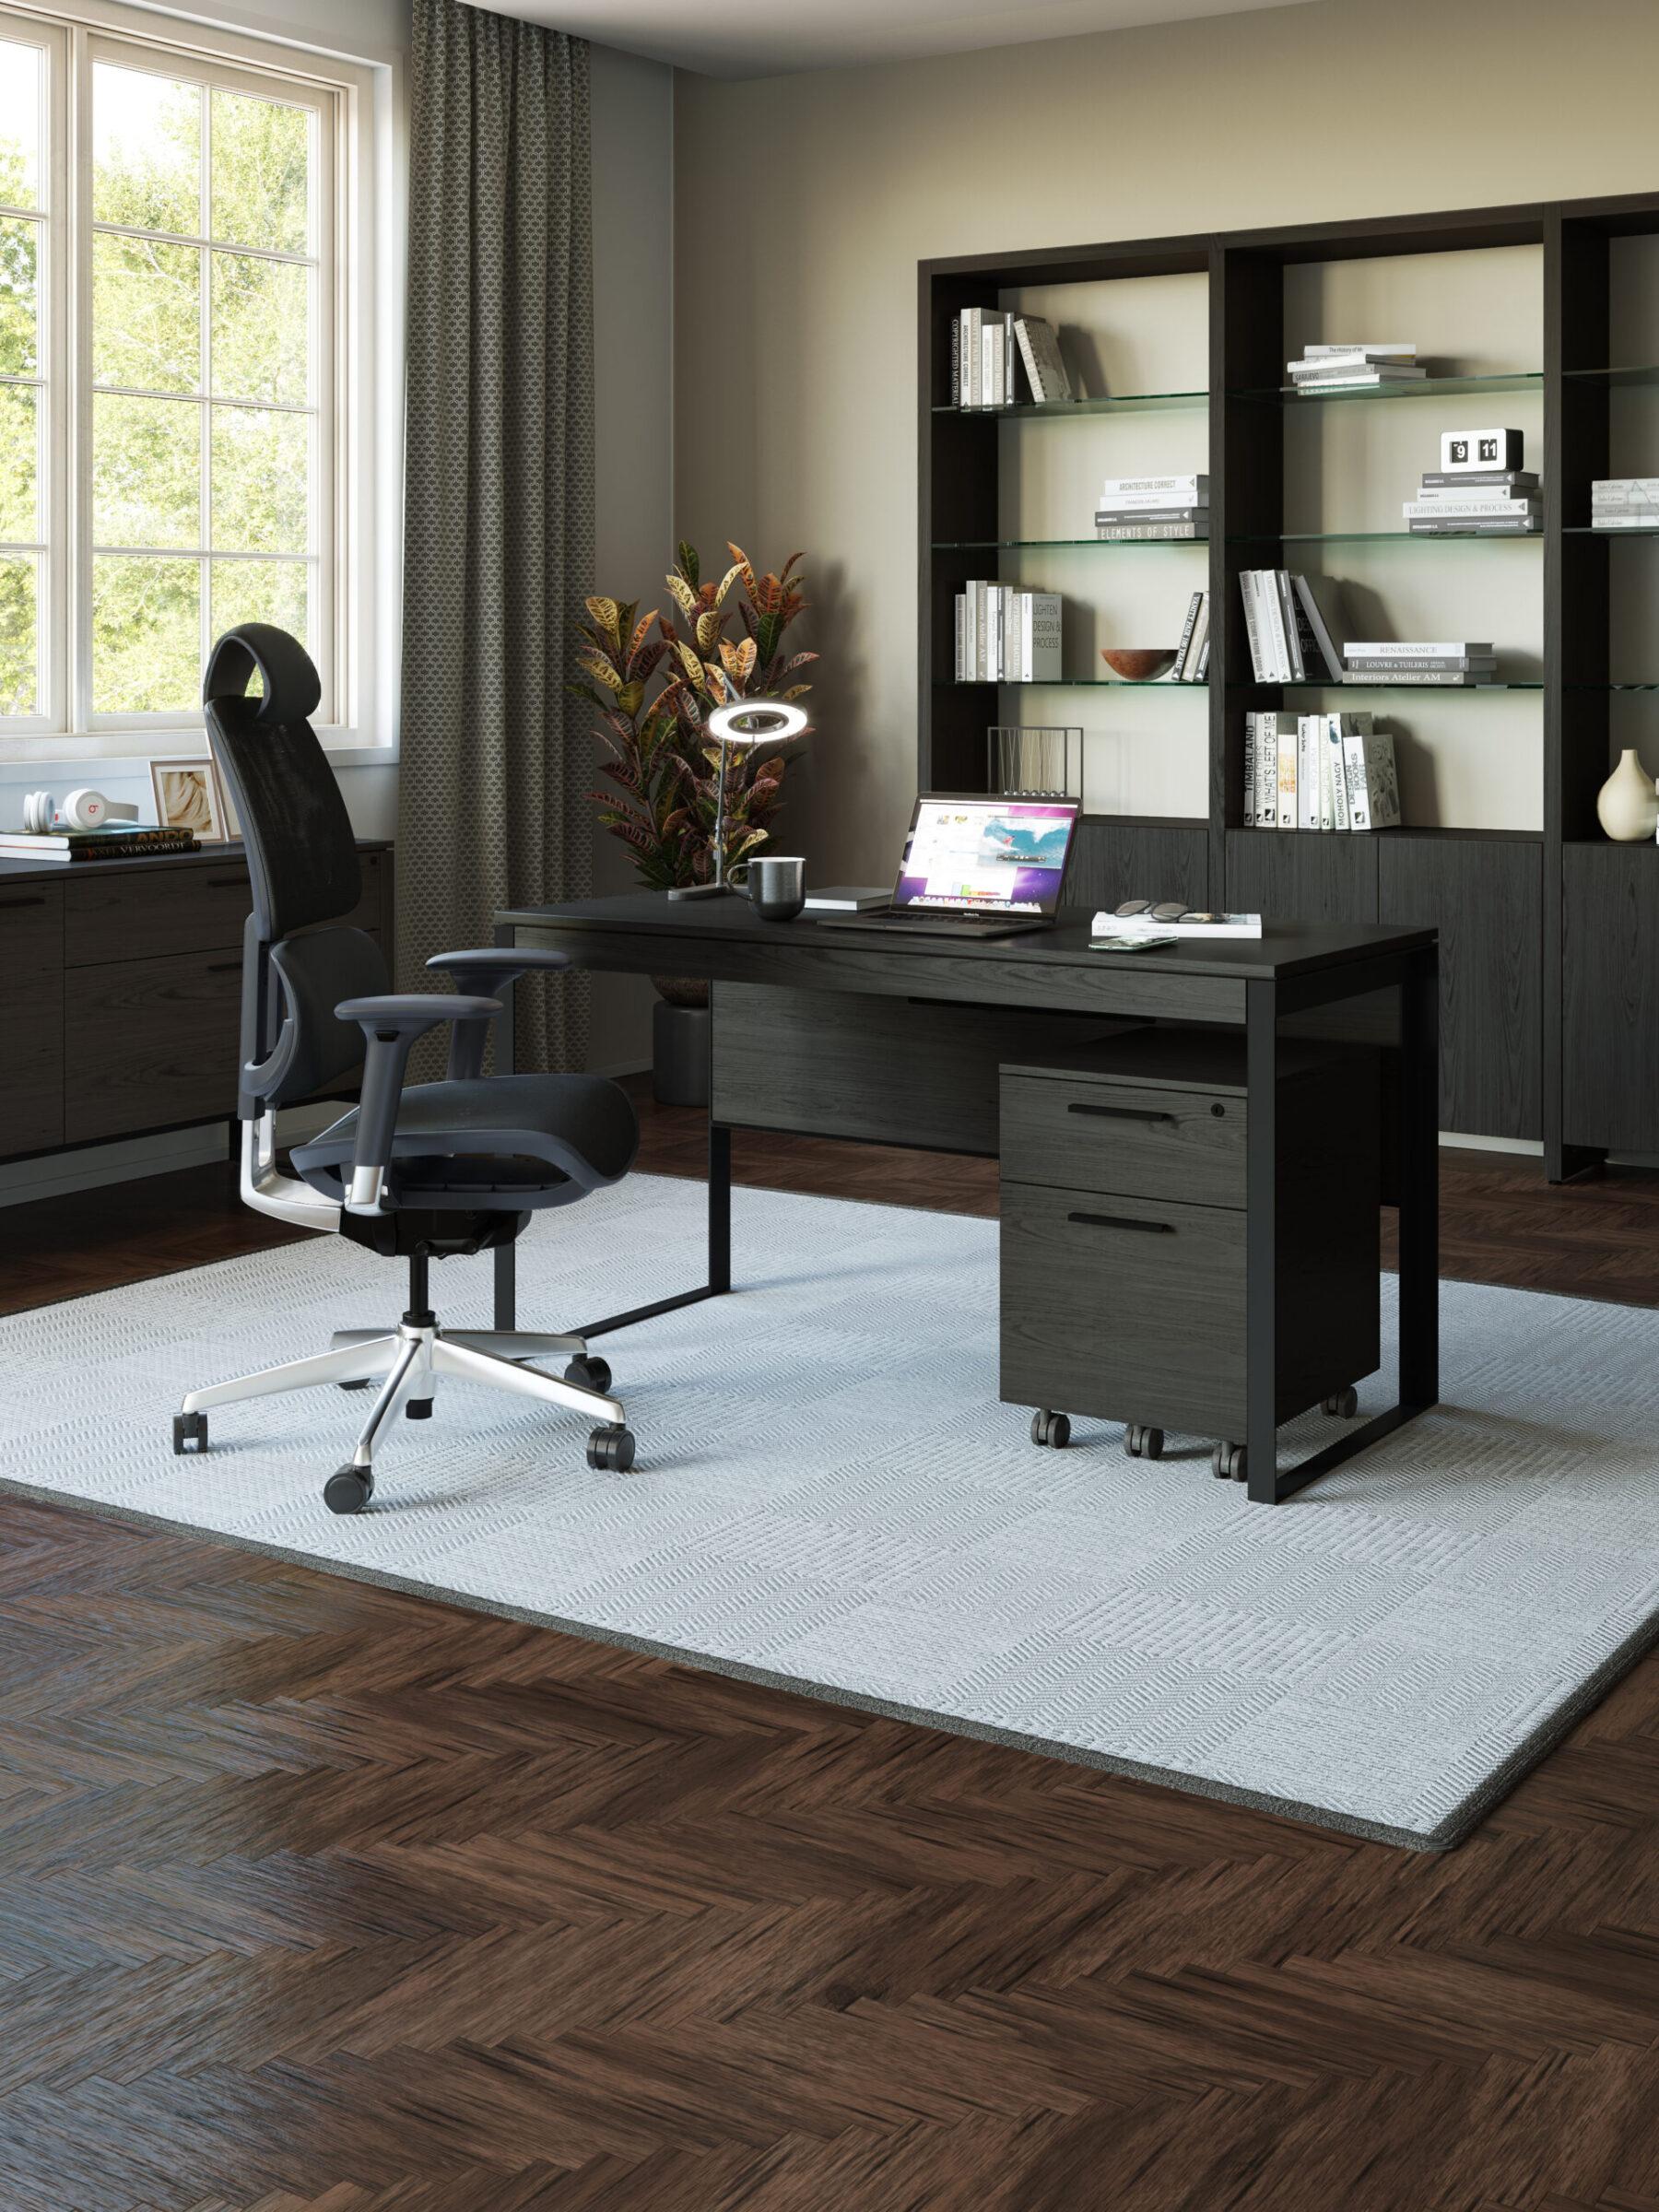 Linea-Desk-6221-BDI-CRL-vert